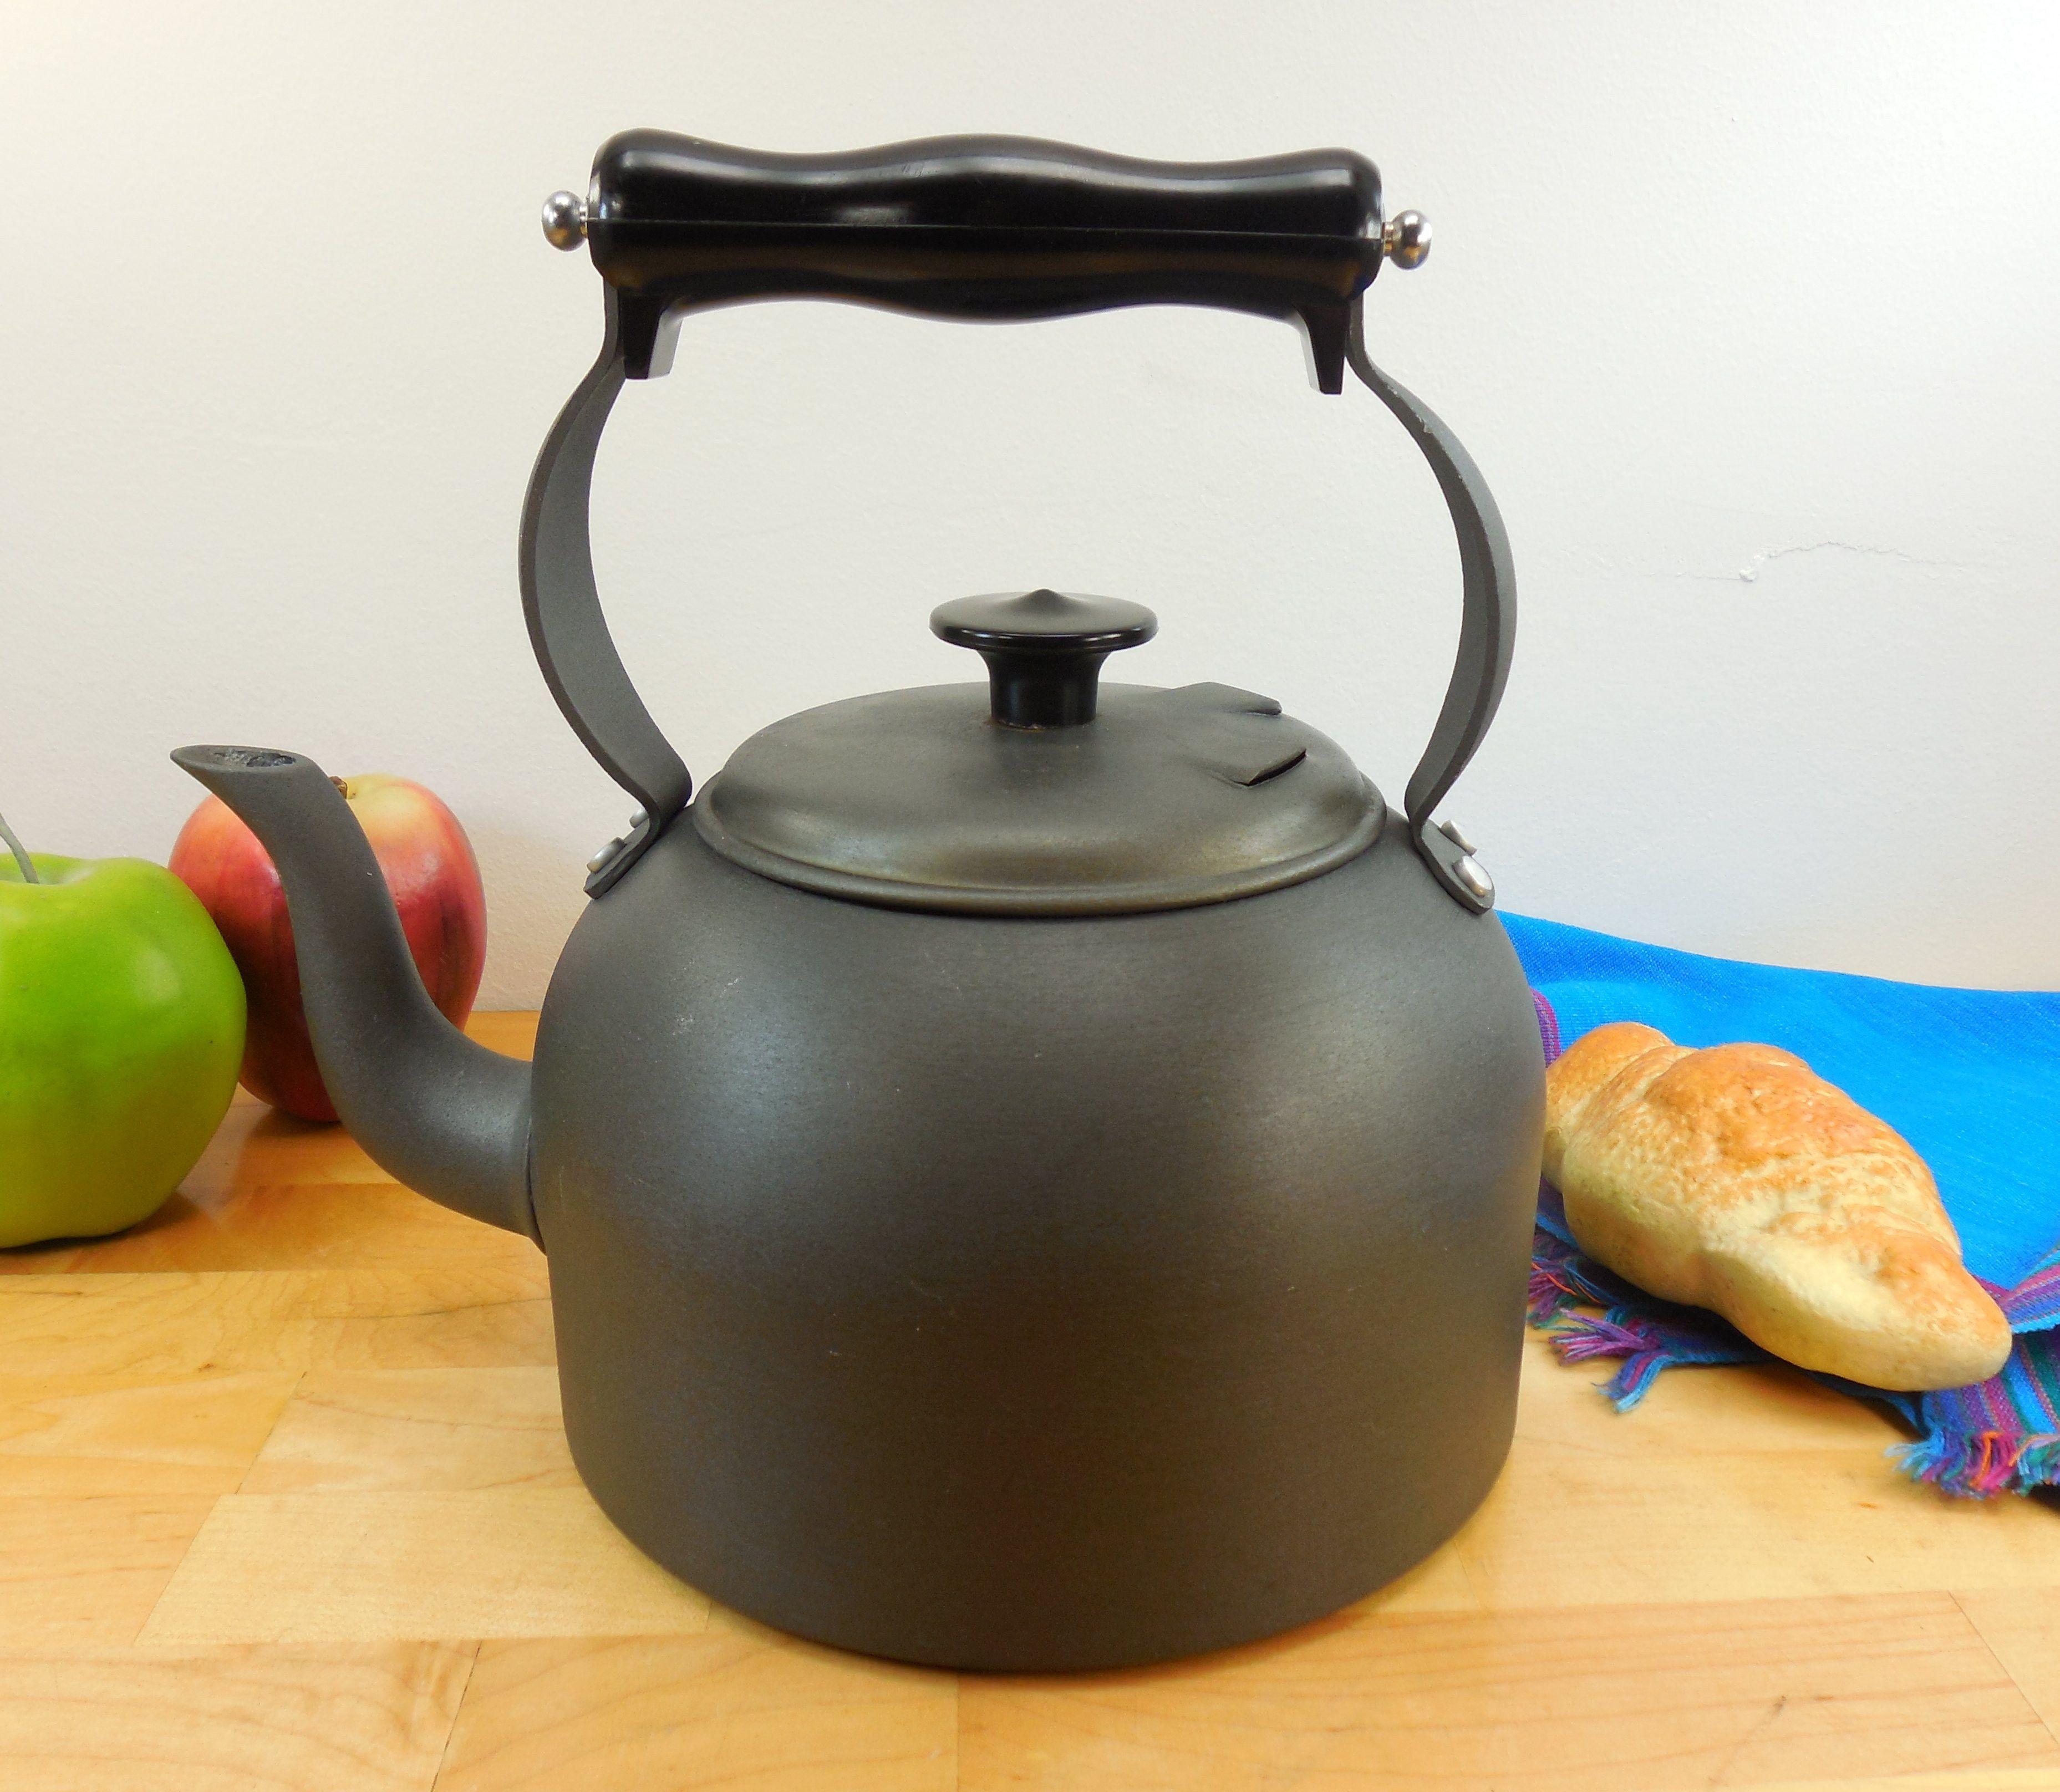 calphalon vintage hard anodized aluminum teapot 2 quart water kettle